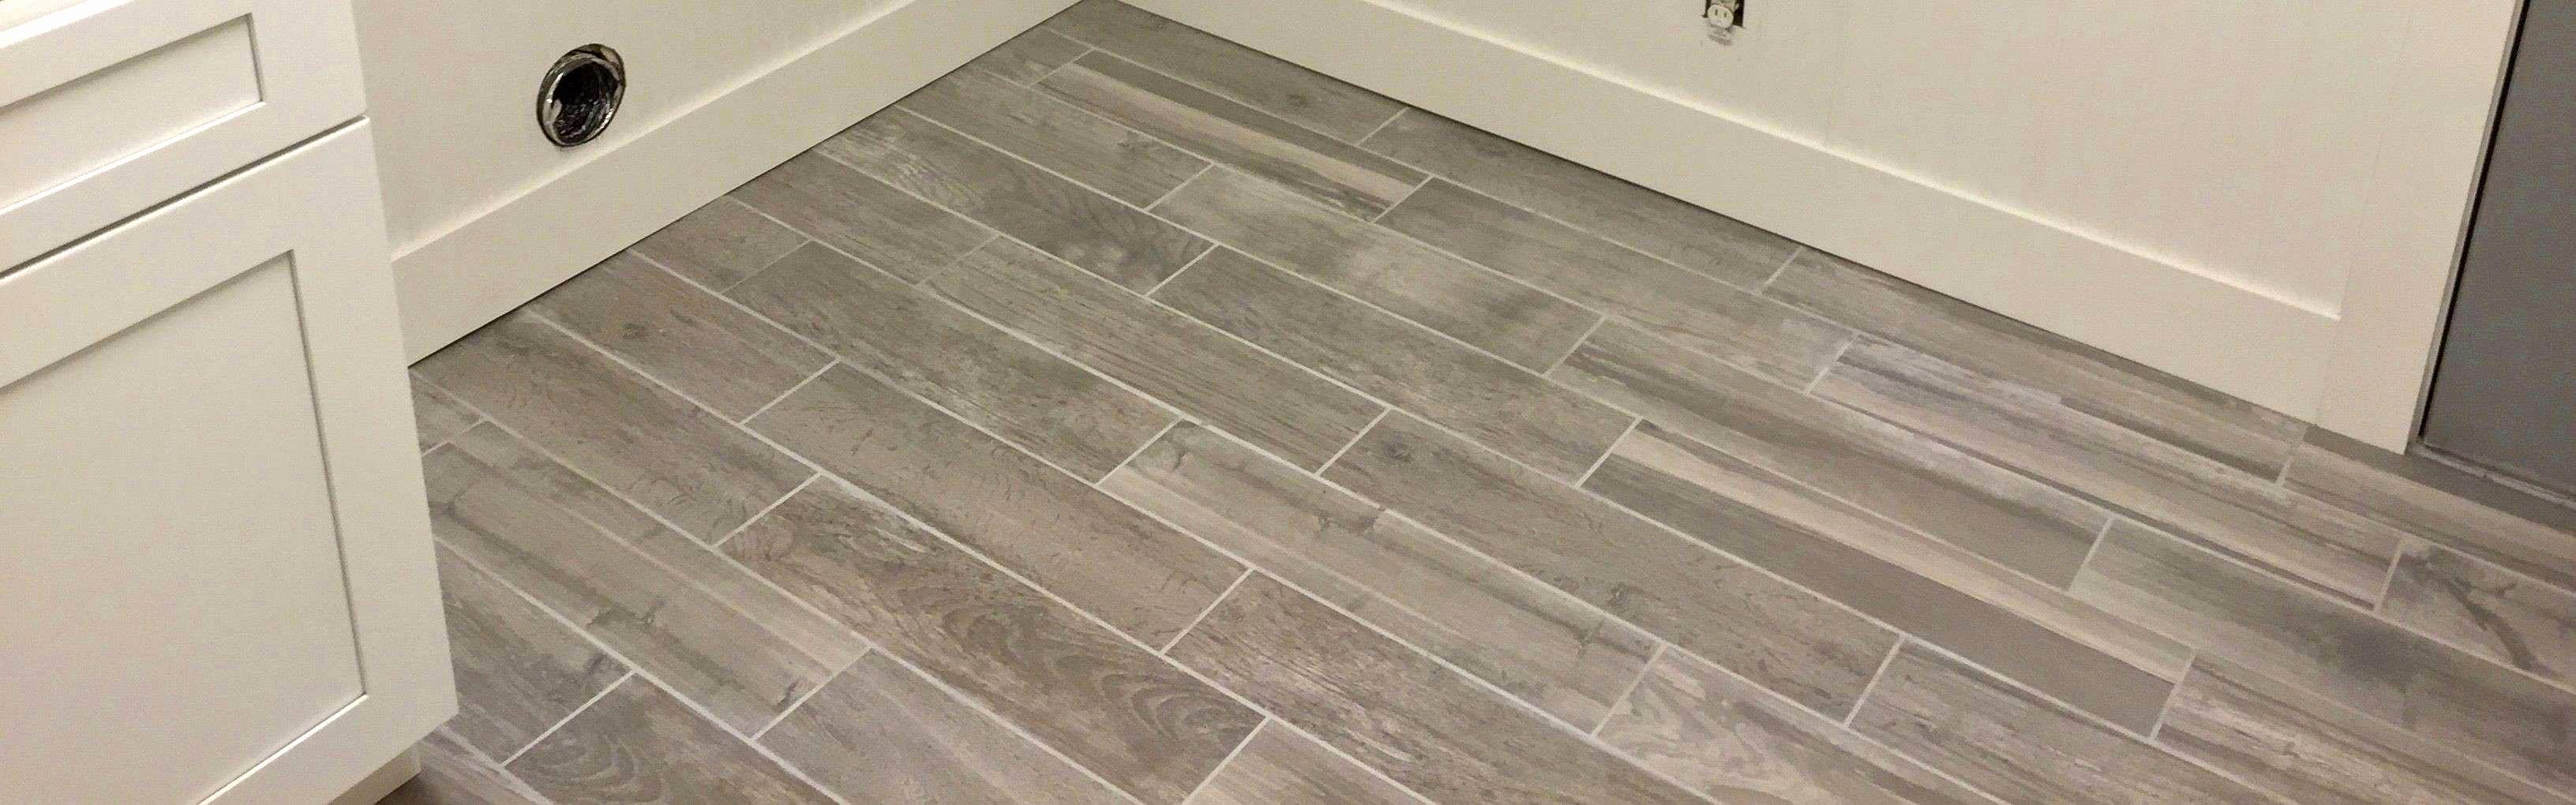 Hardwood Floor Padding Of Carpet Contractors Floor Plan Ideas with Regard to Carpet Contractors 50 New Hardwood Flooring Contractors Graphics 50 S Carpet Contractors Cushion